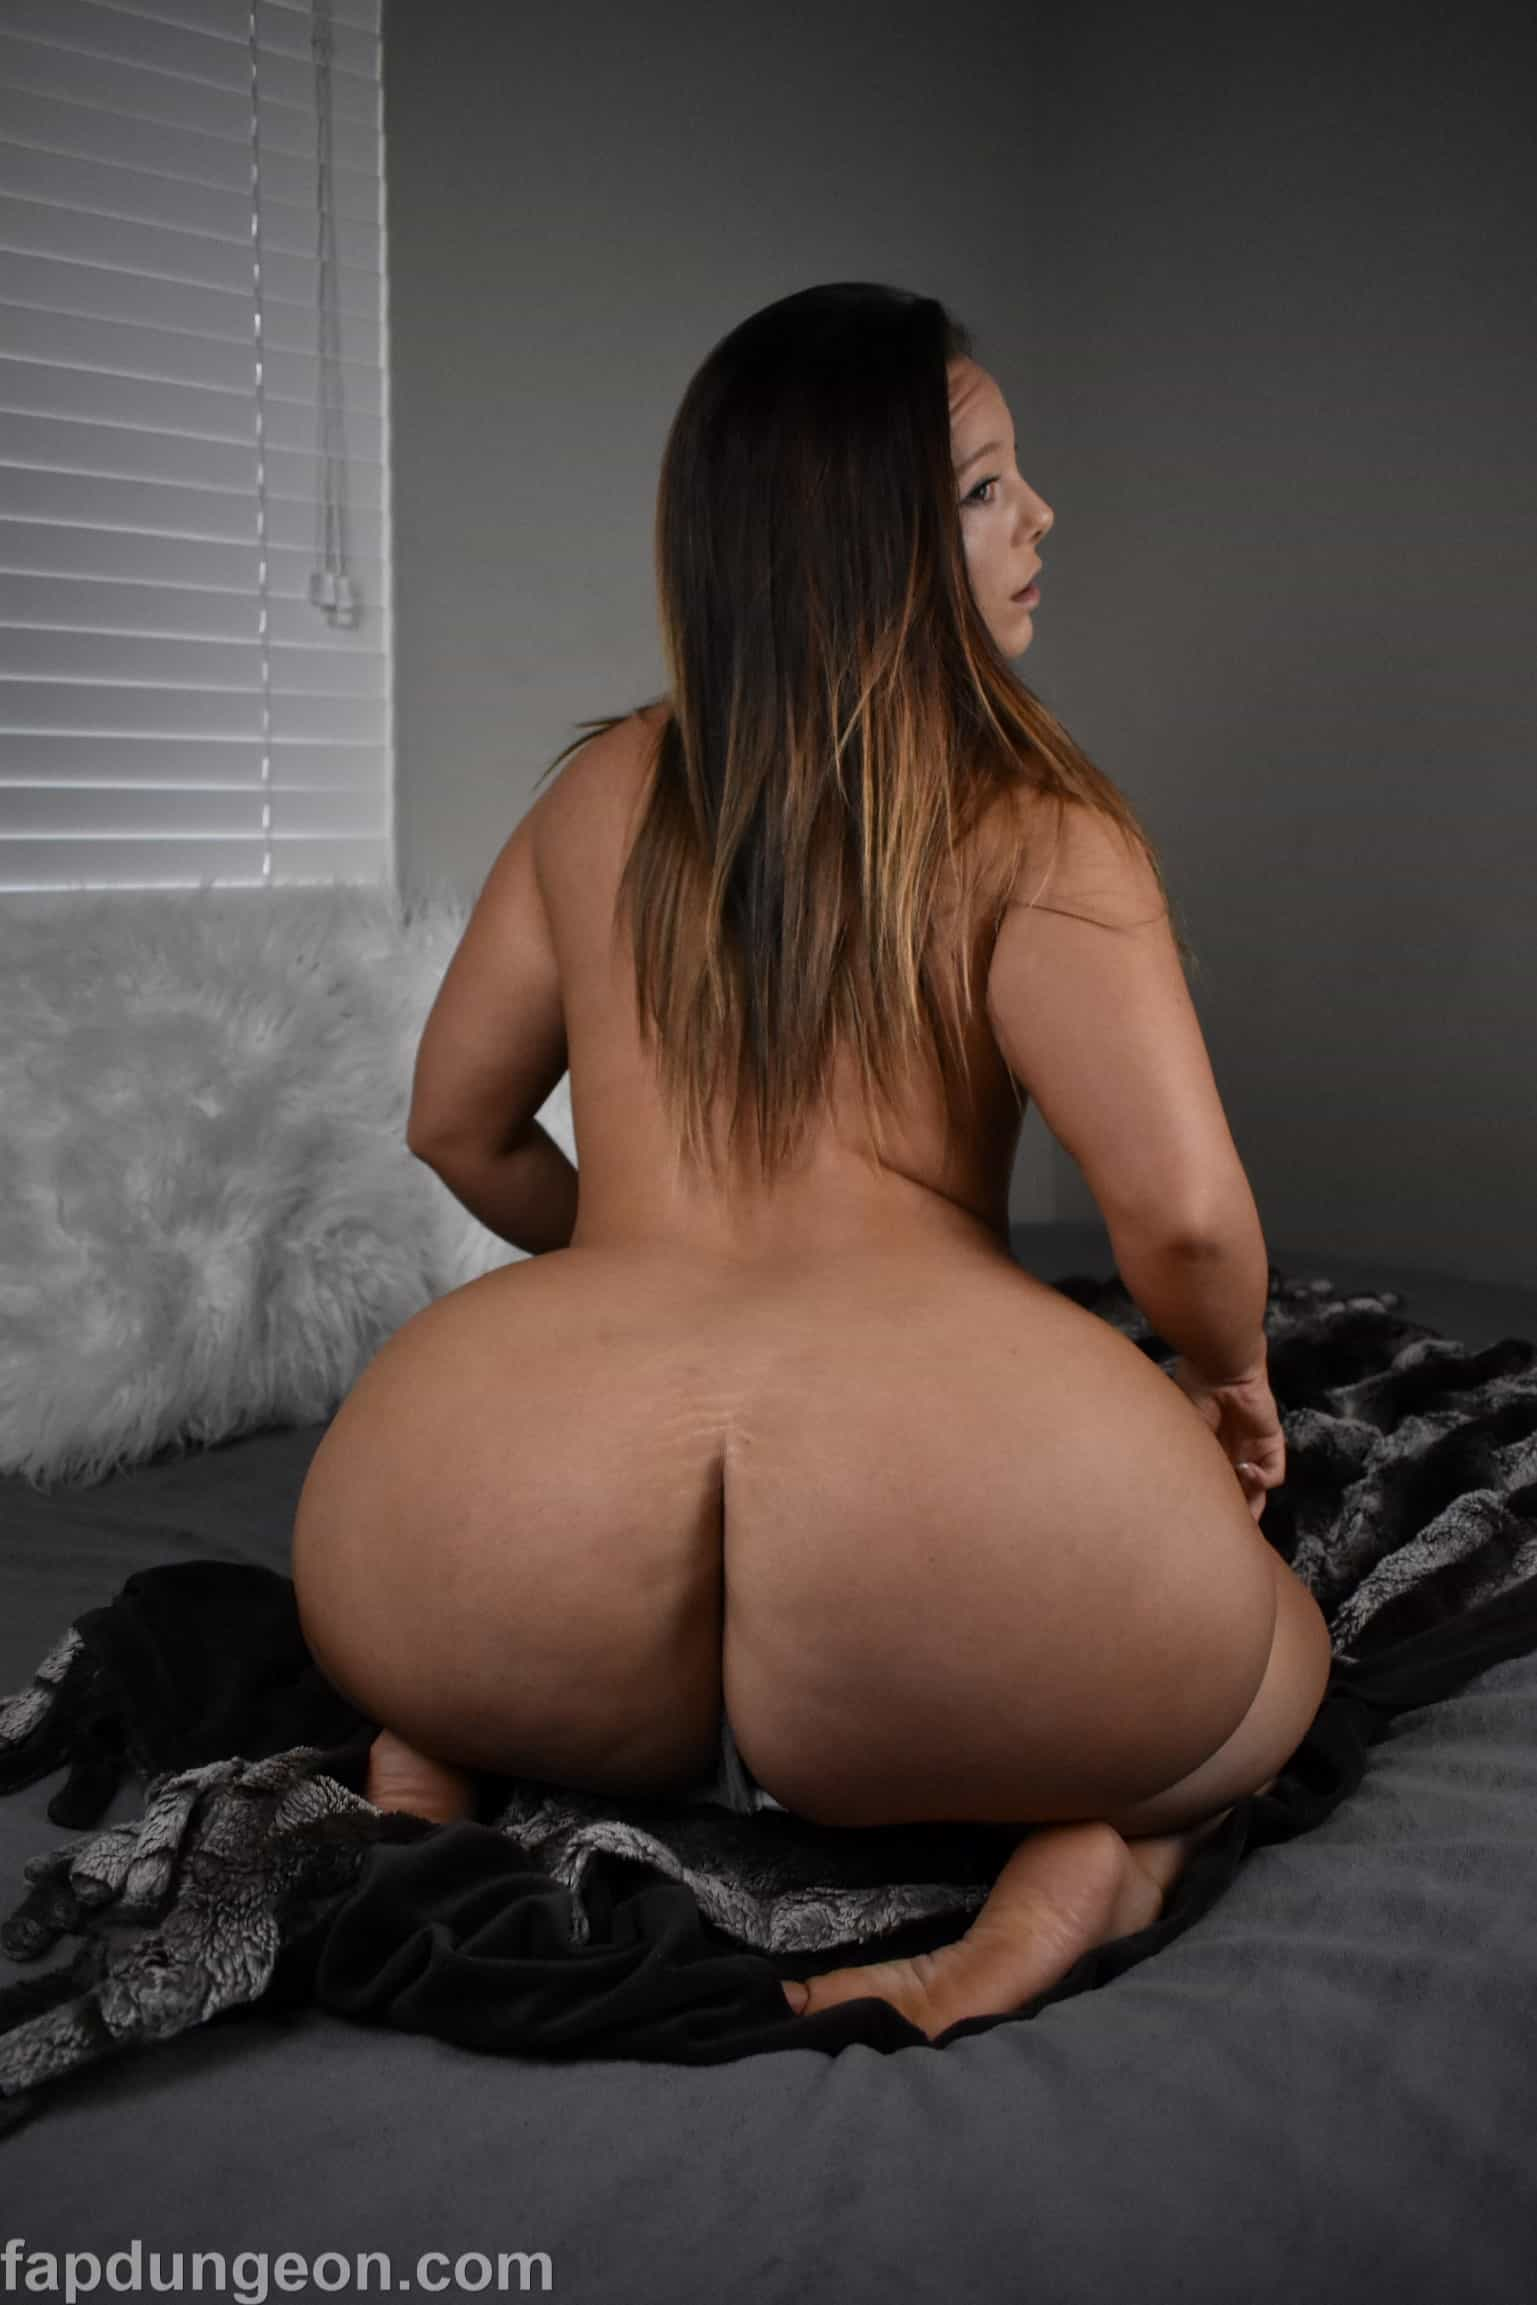 Colorsofautumn Nudes